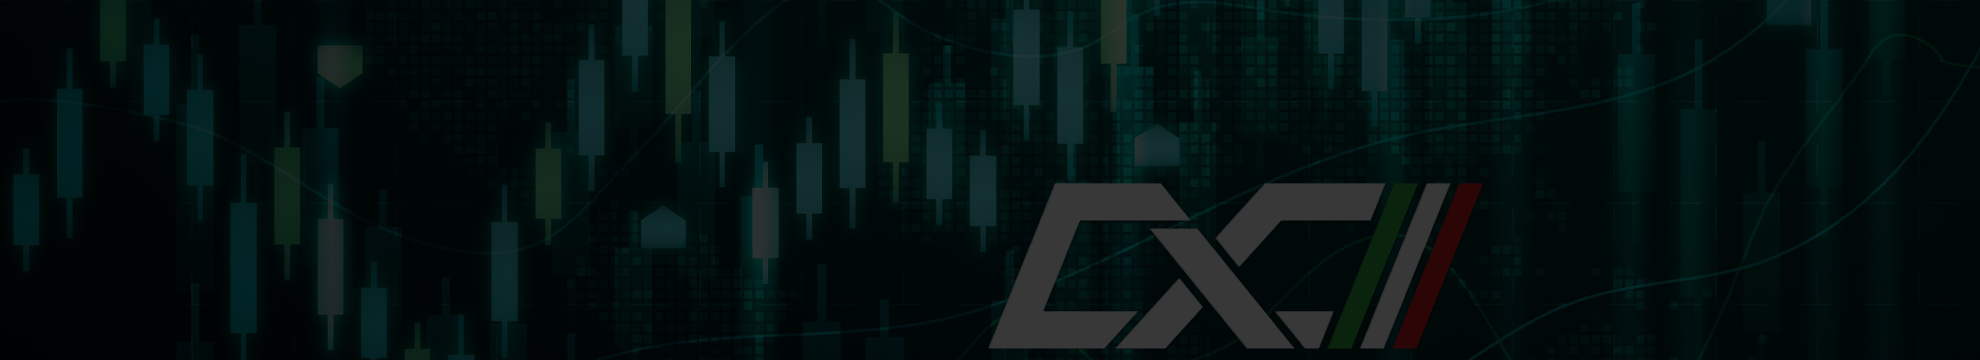 CXCMarkets_取引商品背景画像.png